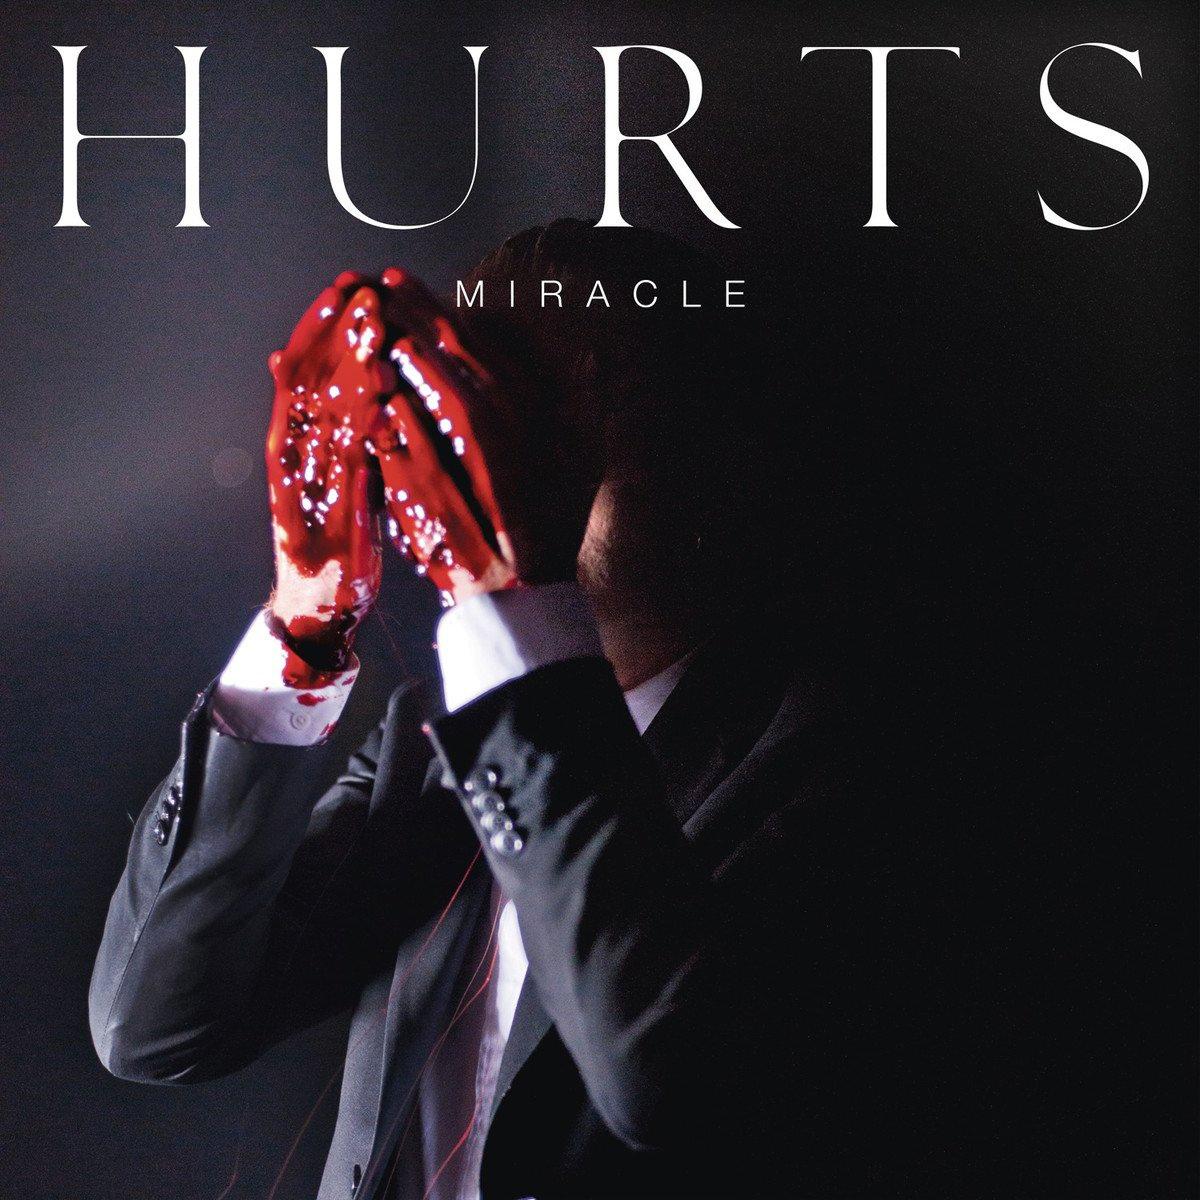 Hurts album Miracle